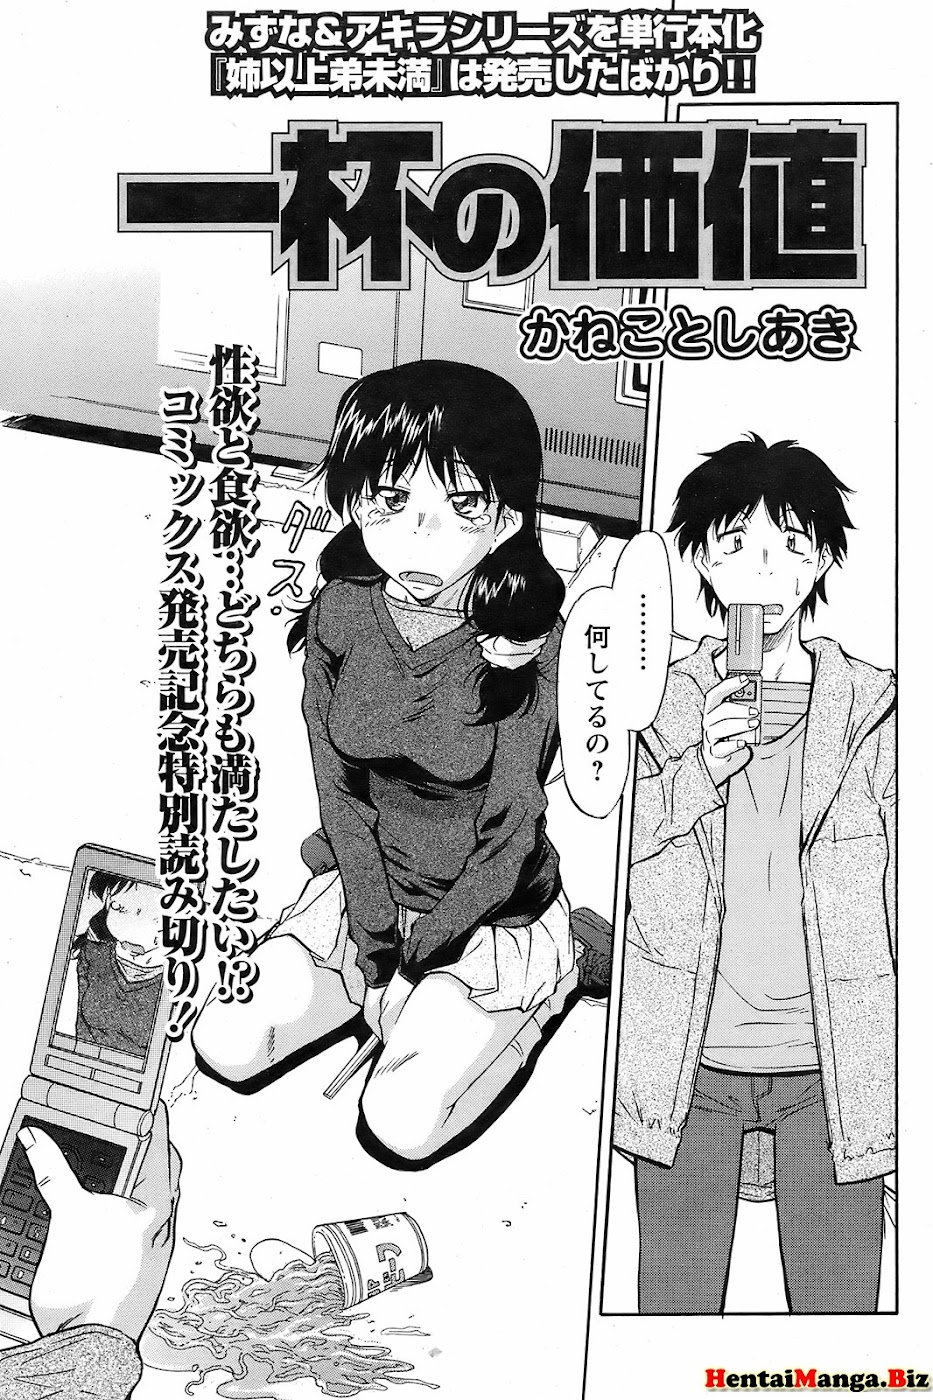 Incest Hentai - kaneko toshiaki    18 episode megastore etc-Read-Hentai-Manga-Onlnie